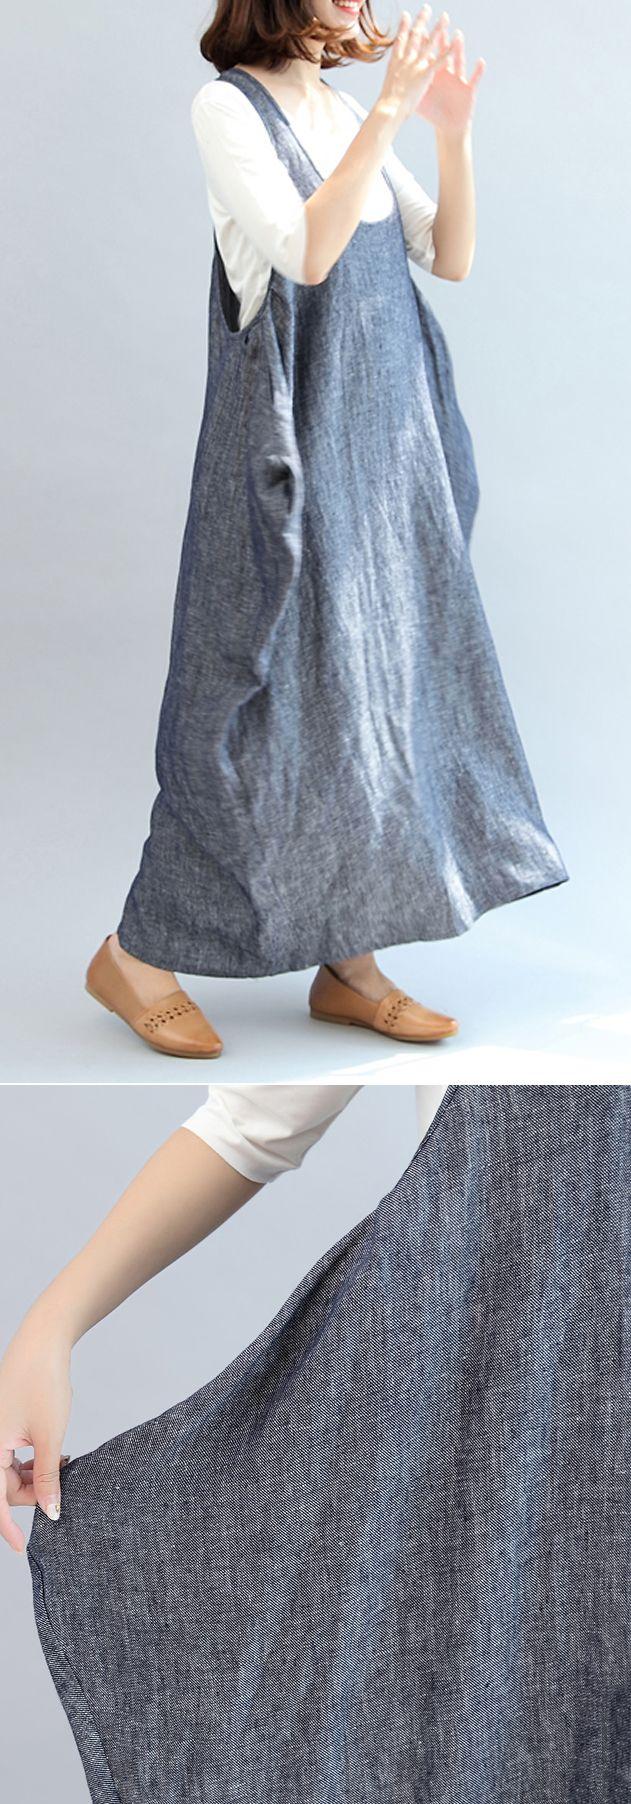 blue gray  cotton  plus size casual sleeveless maxi dress